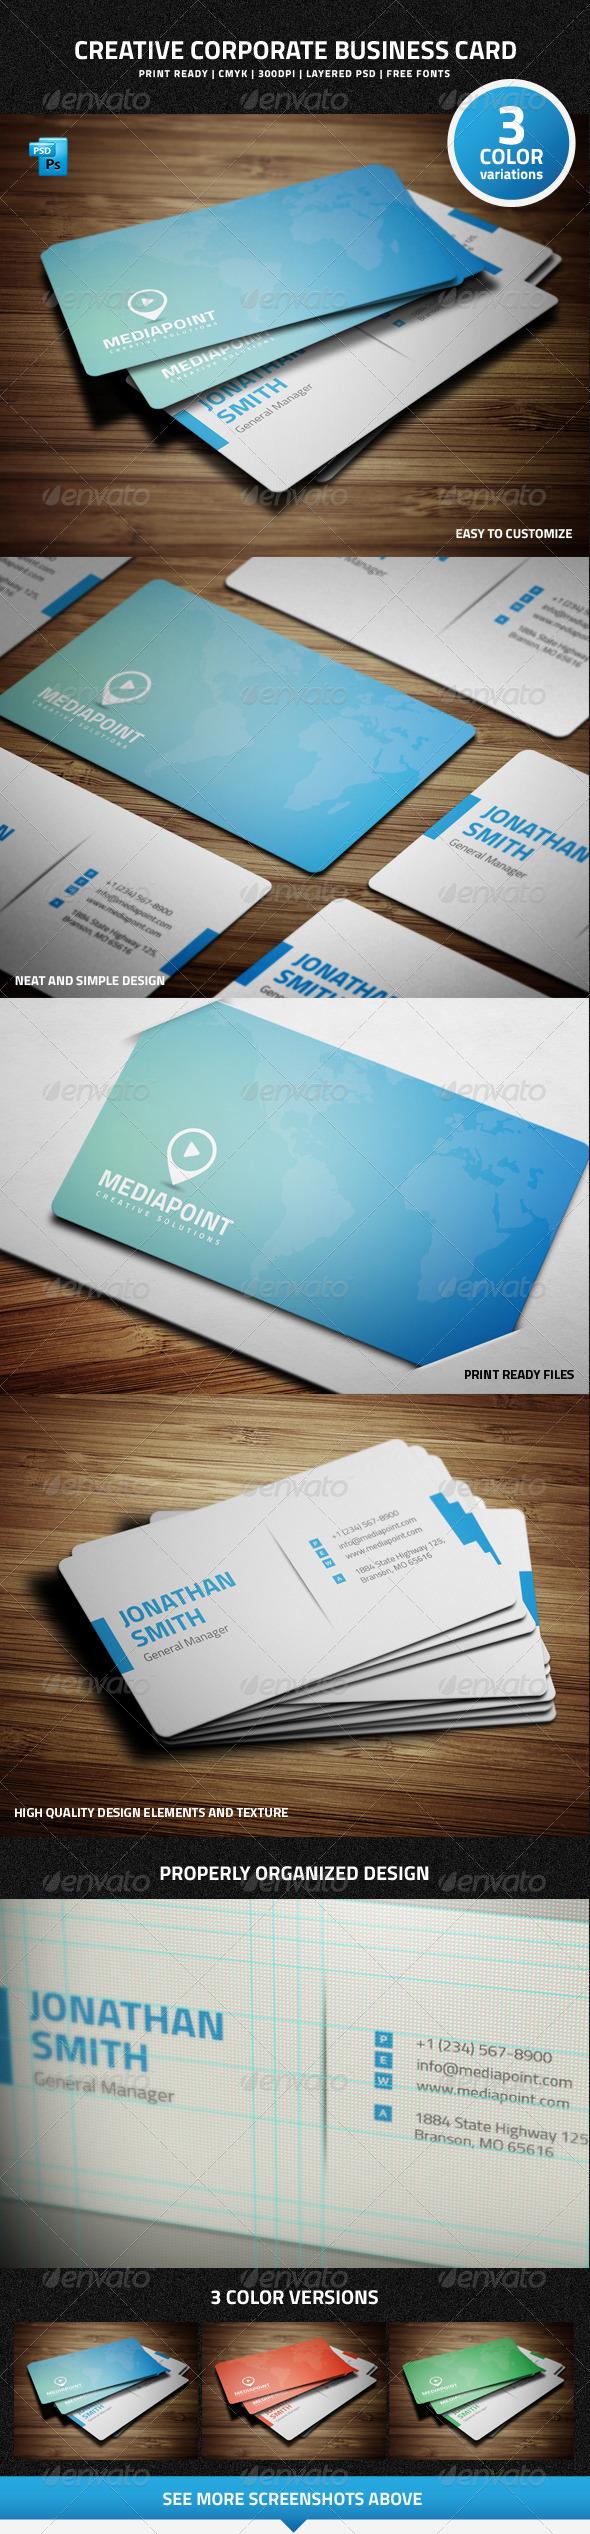 GraphicRiver Creative Corporate Business Card 7431819